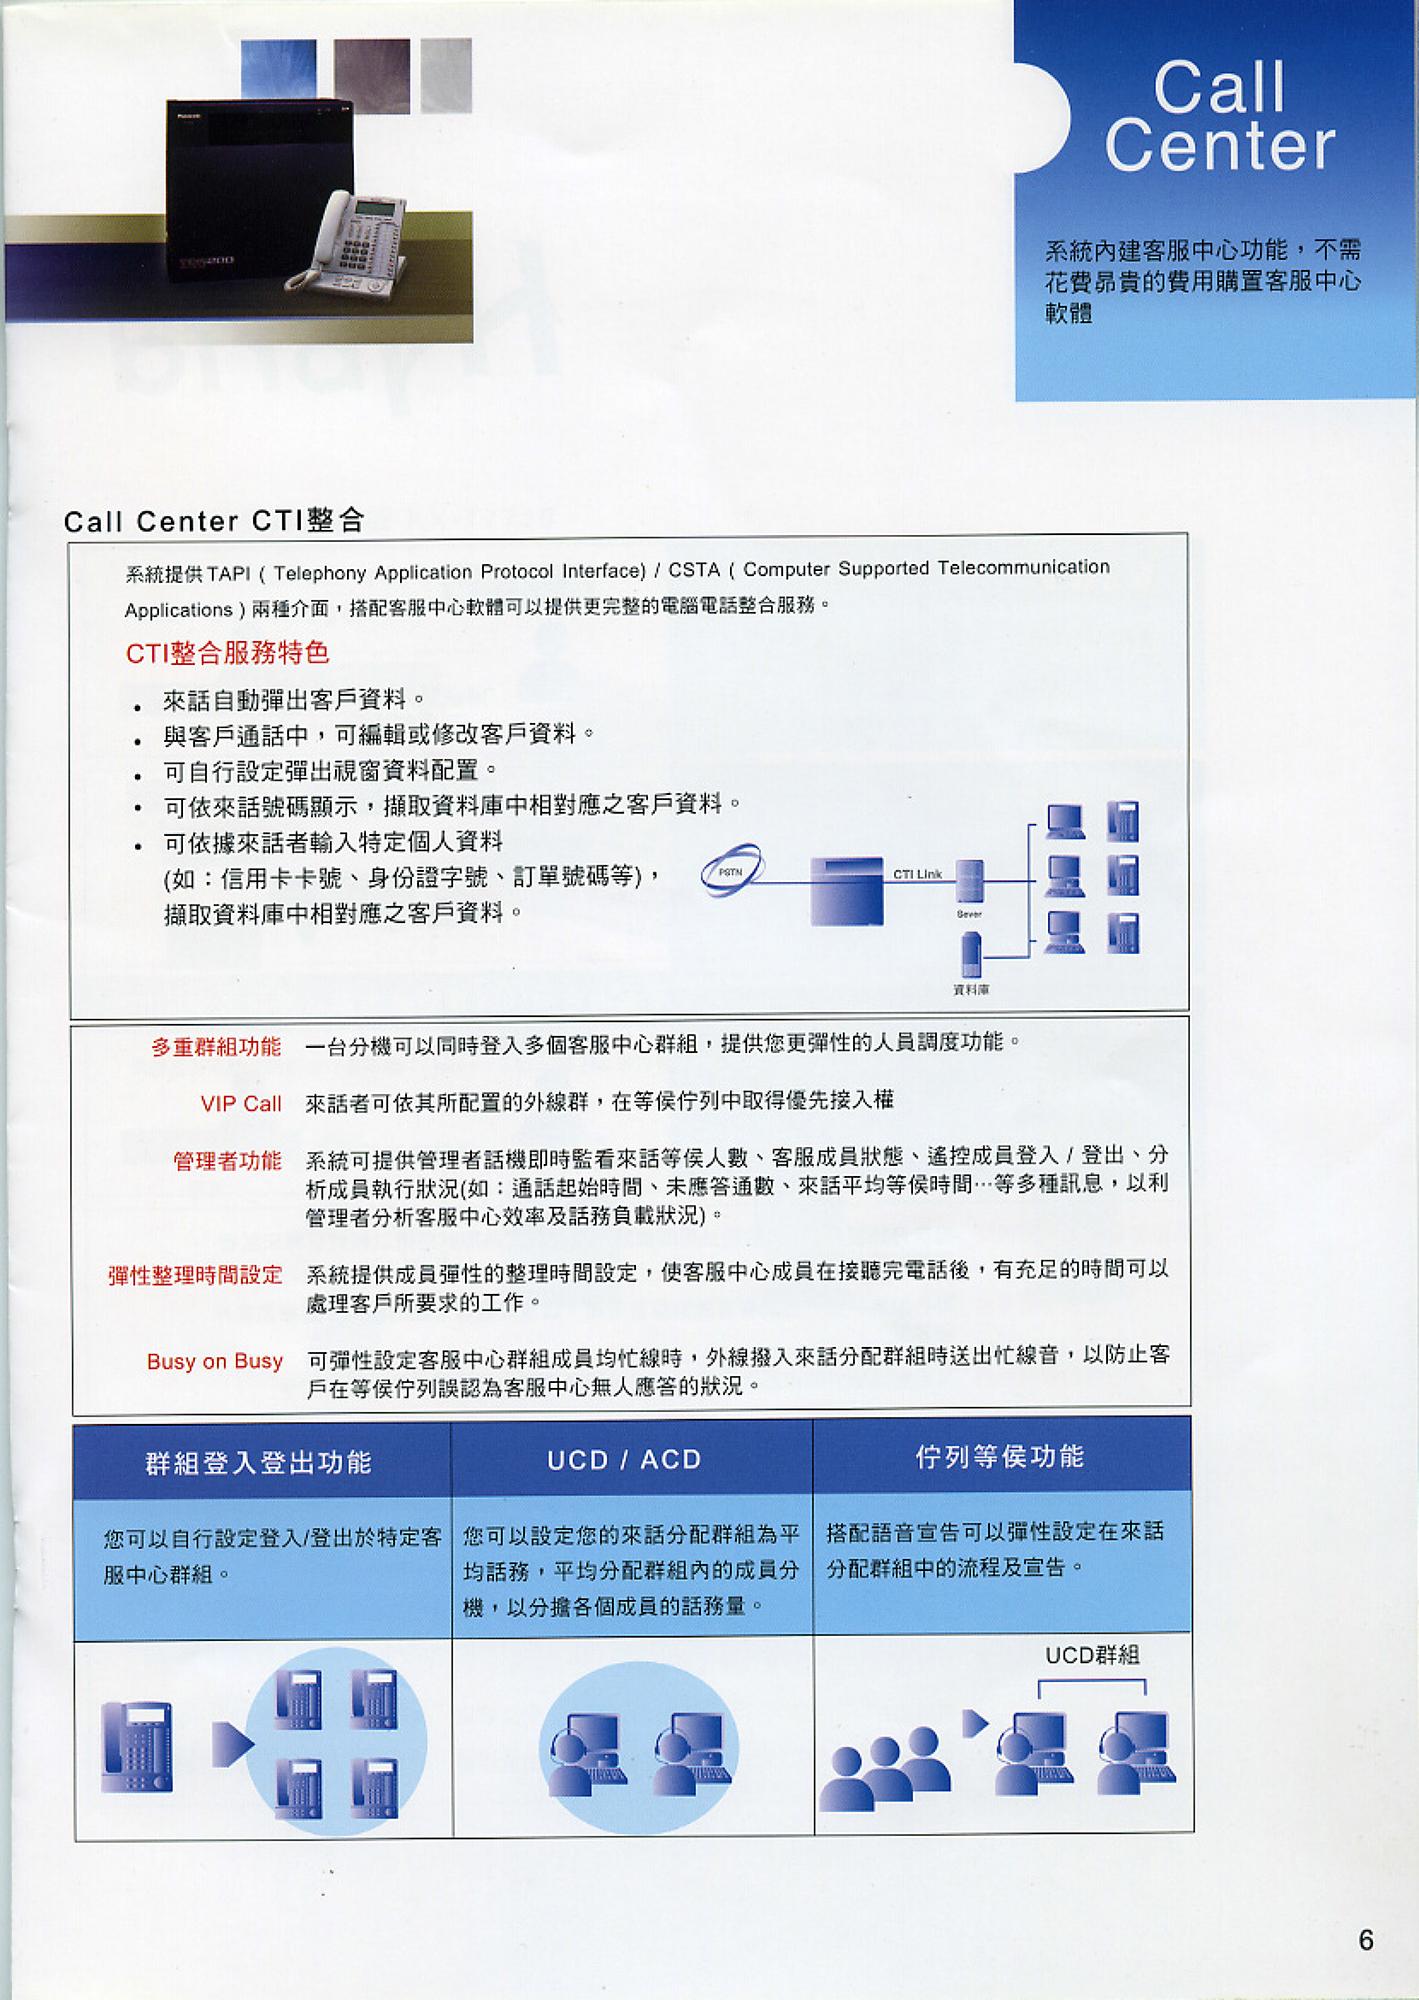 KX-TDA數位超融合式IP交換機-7.jpg